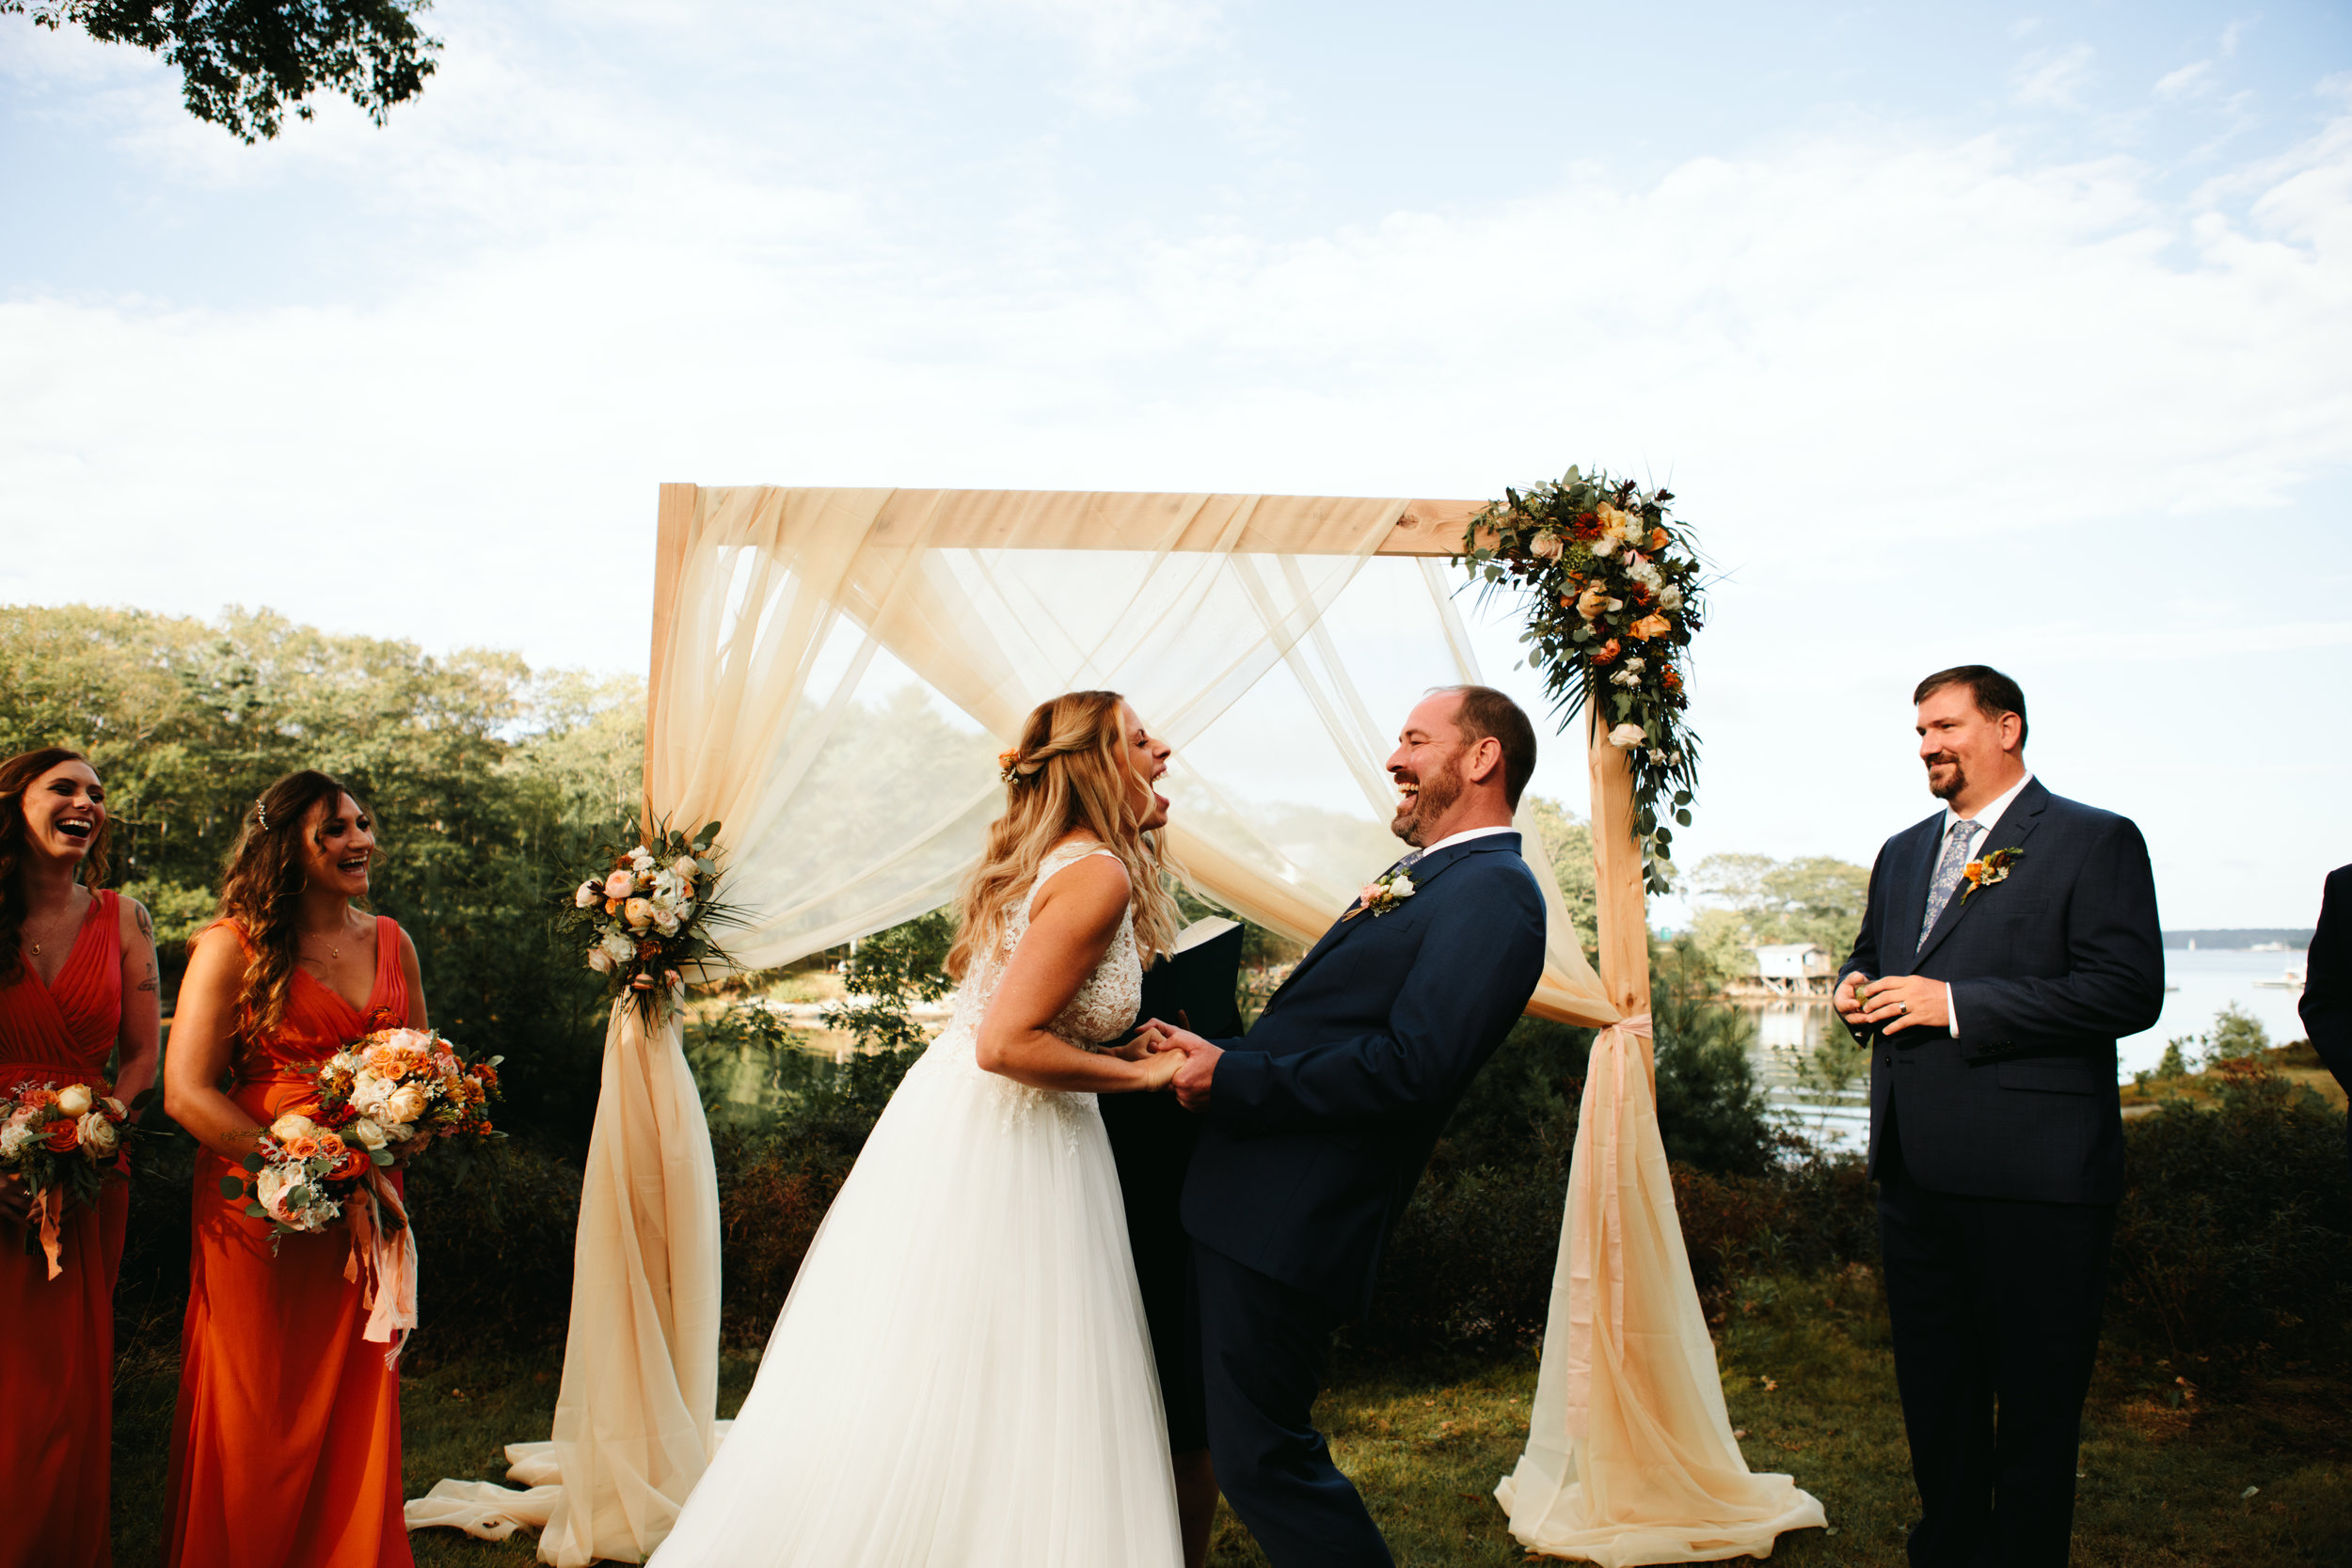 bohemian-wedding-ceremony-new-england